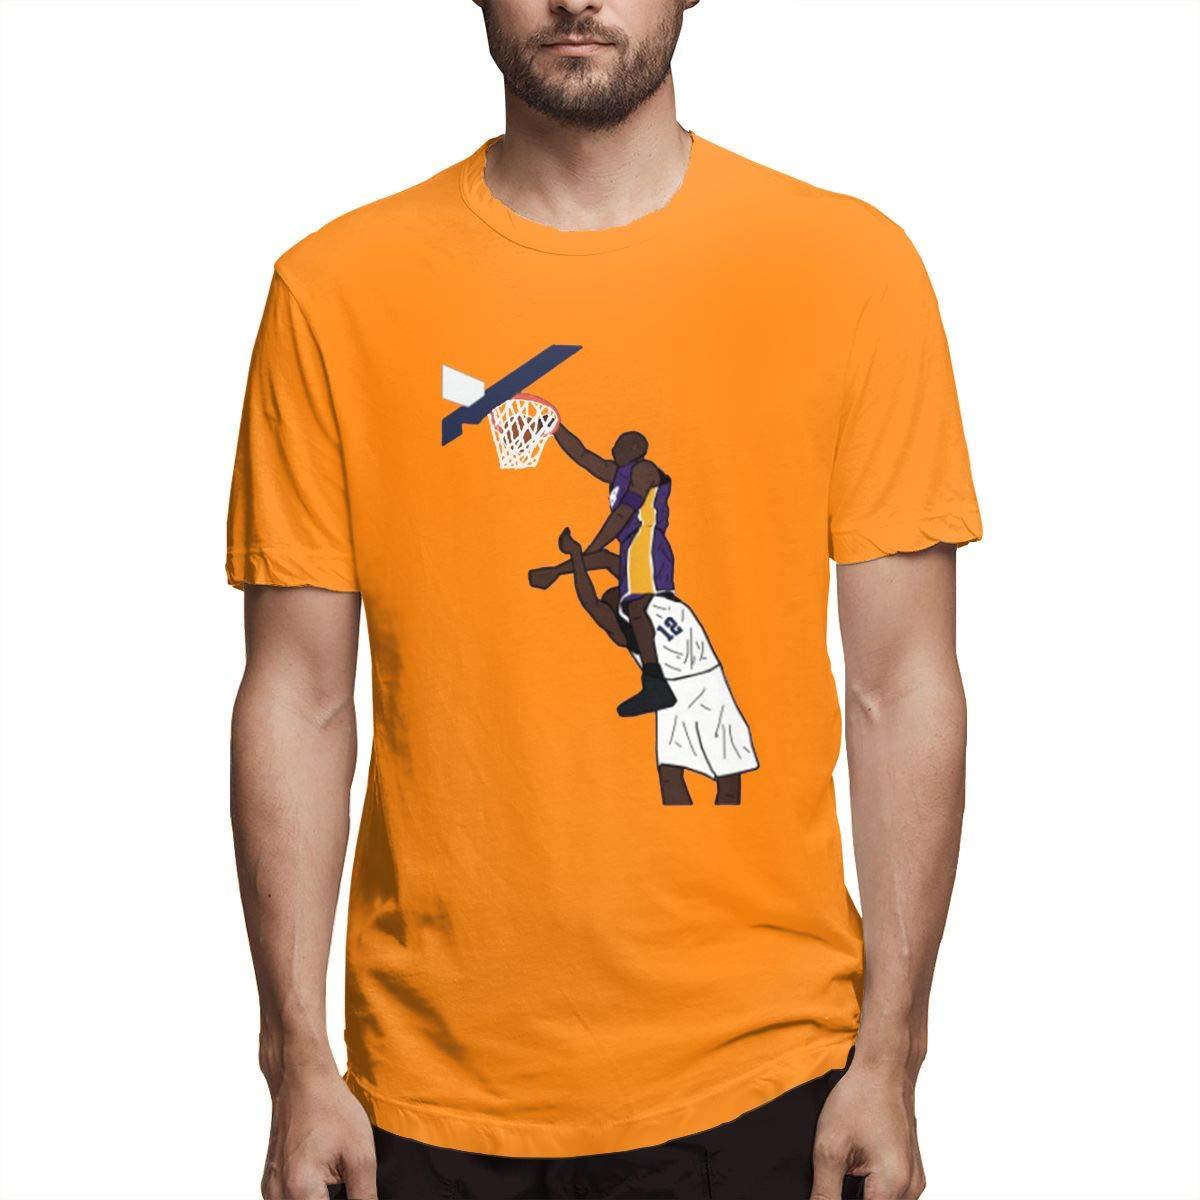 Basketball Clothing Kob E Slam Dunk Howar D Shirts